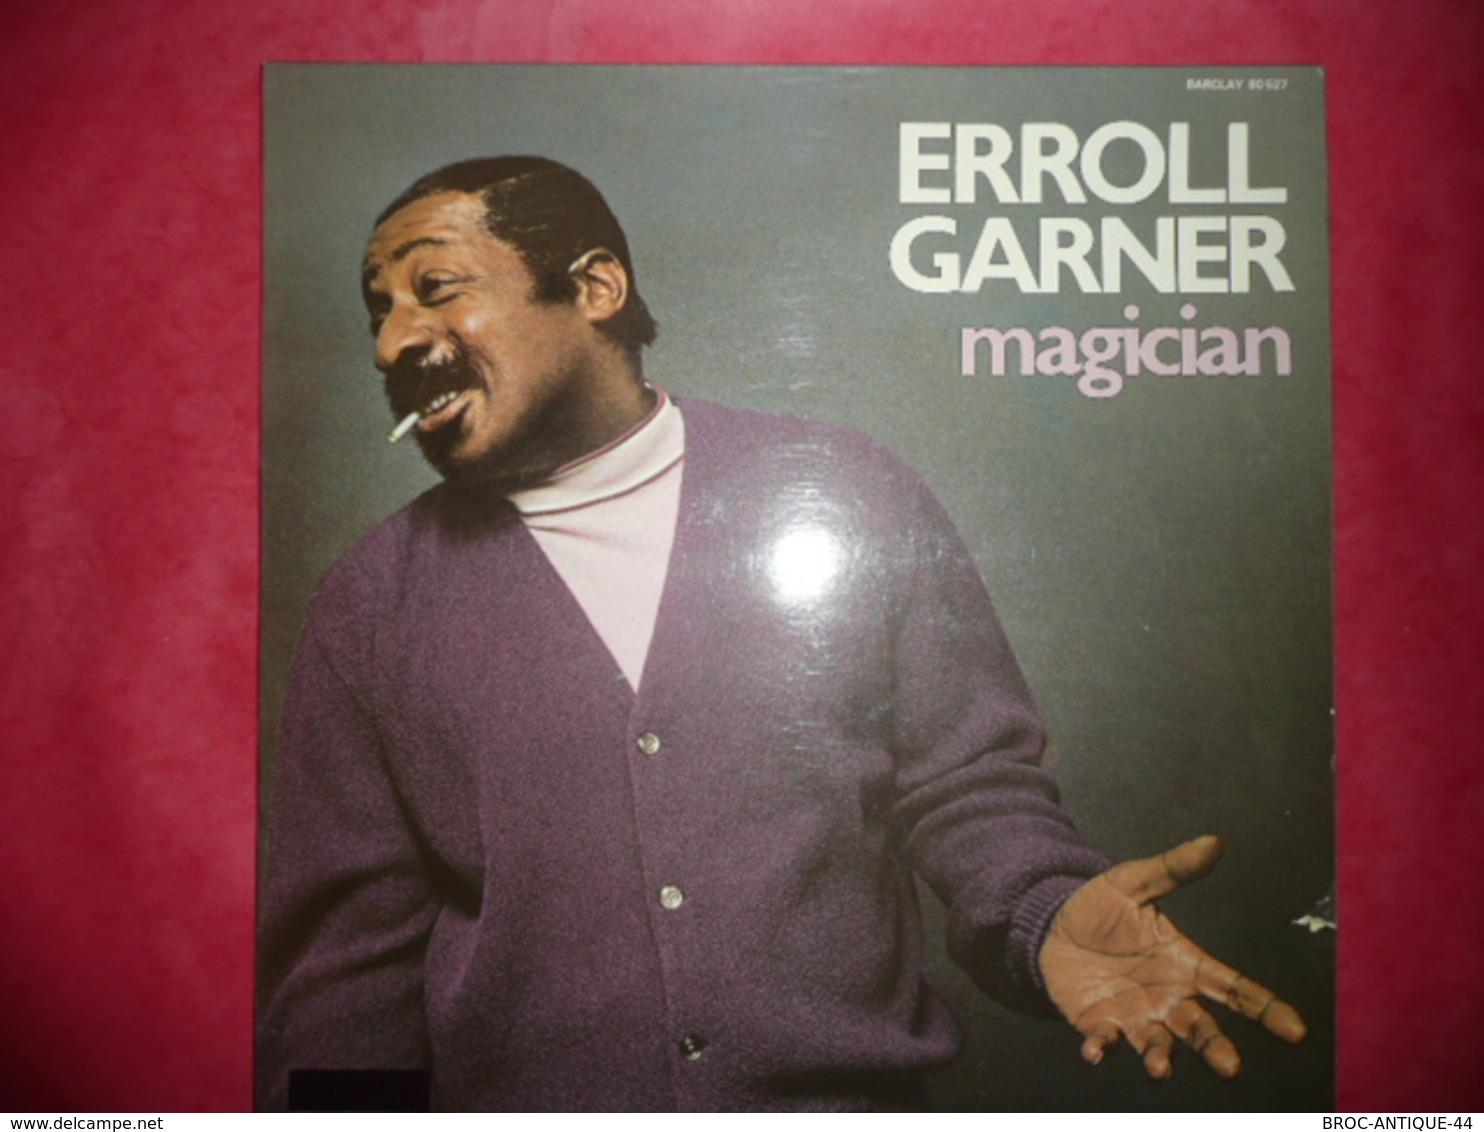 LP33 N°2929 - ERROLL GARNER - MAGICIAN - 80527 - DISQUE EPAIS ***** - Jazz